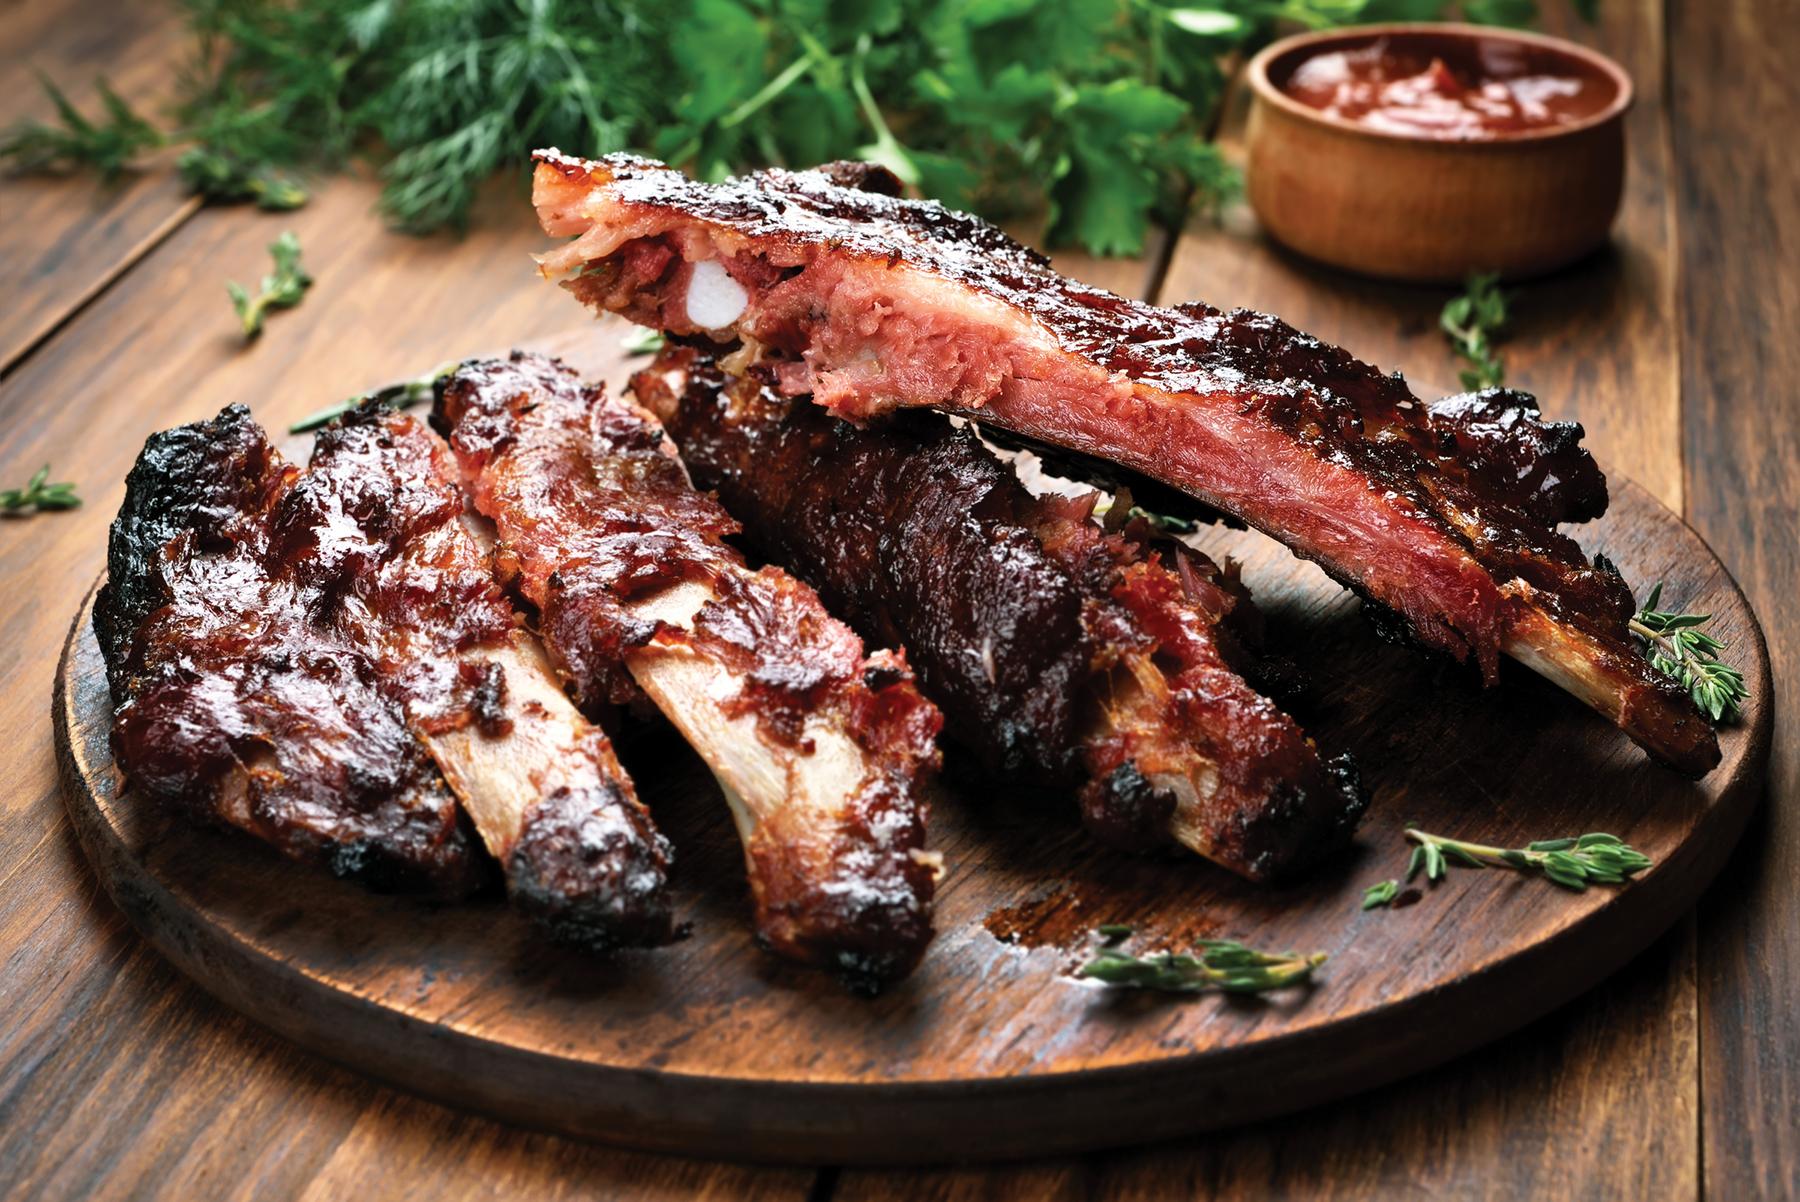 How to Smoke Meat Like a Professional